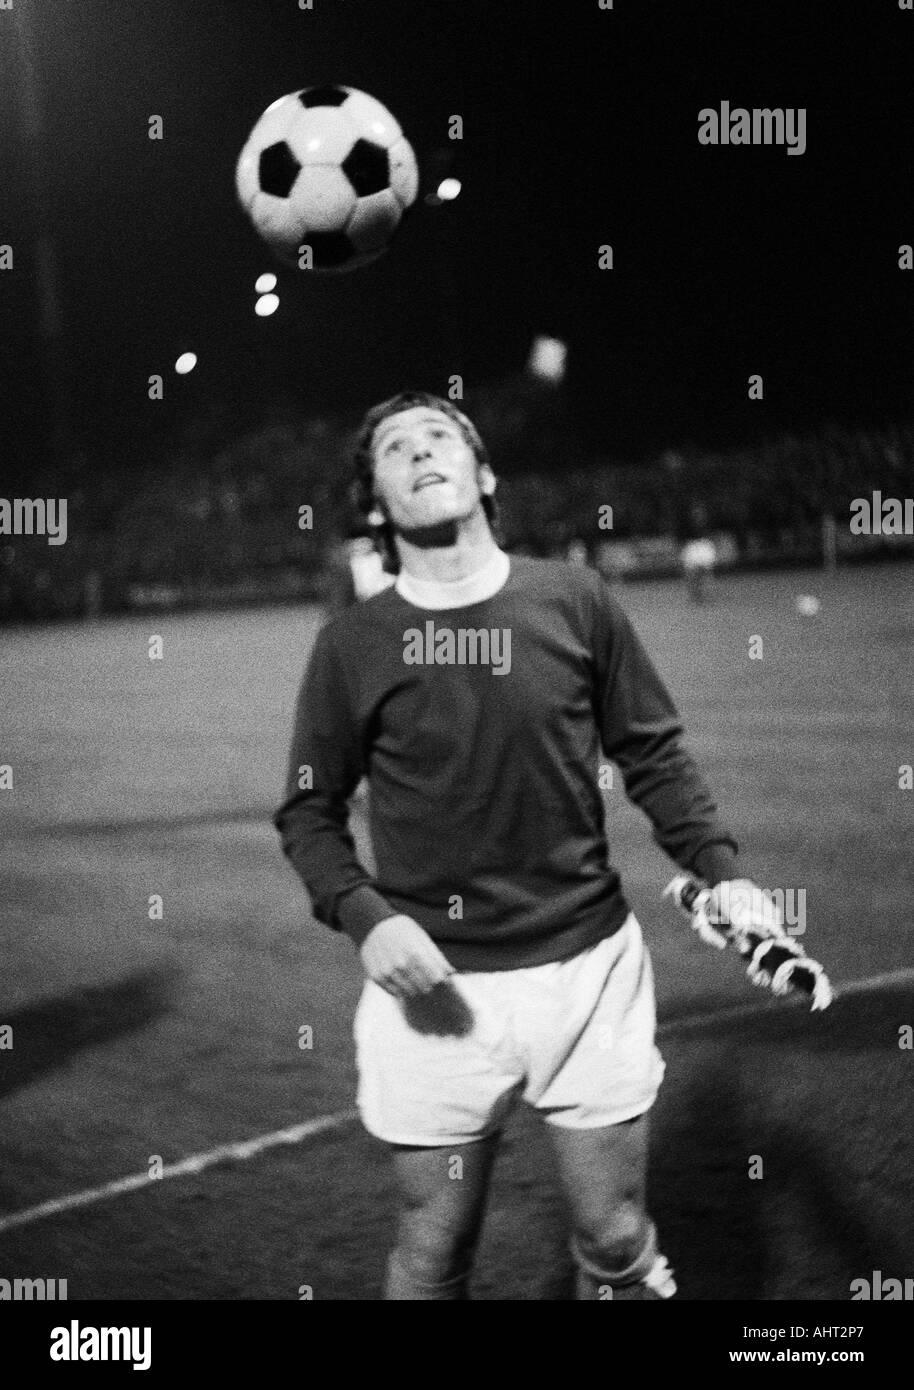 football, European Cup, eighth final, first leg, 1970/1971, Boekelberg Stadium in Moenchengladbach, Borussia Moenchengladbach versus FC Everton 1:1, football player, Alan Ball (Everton) - Stock Image